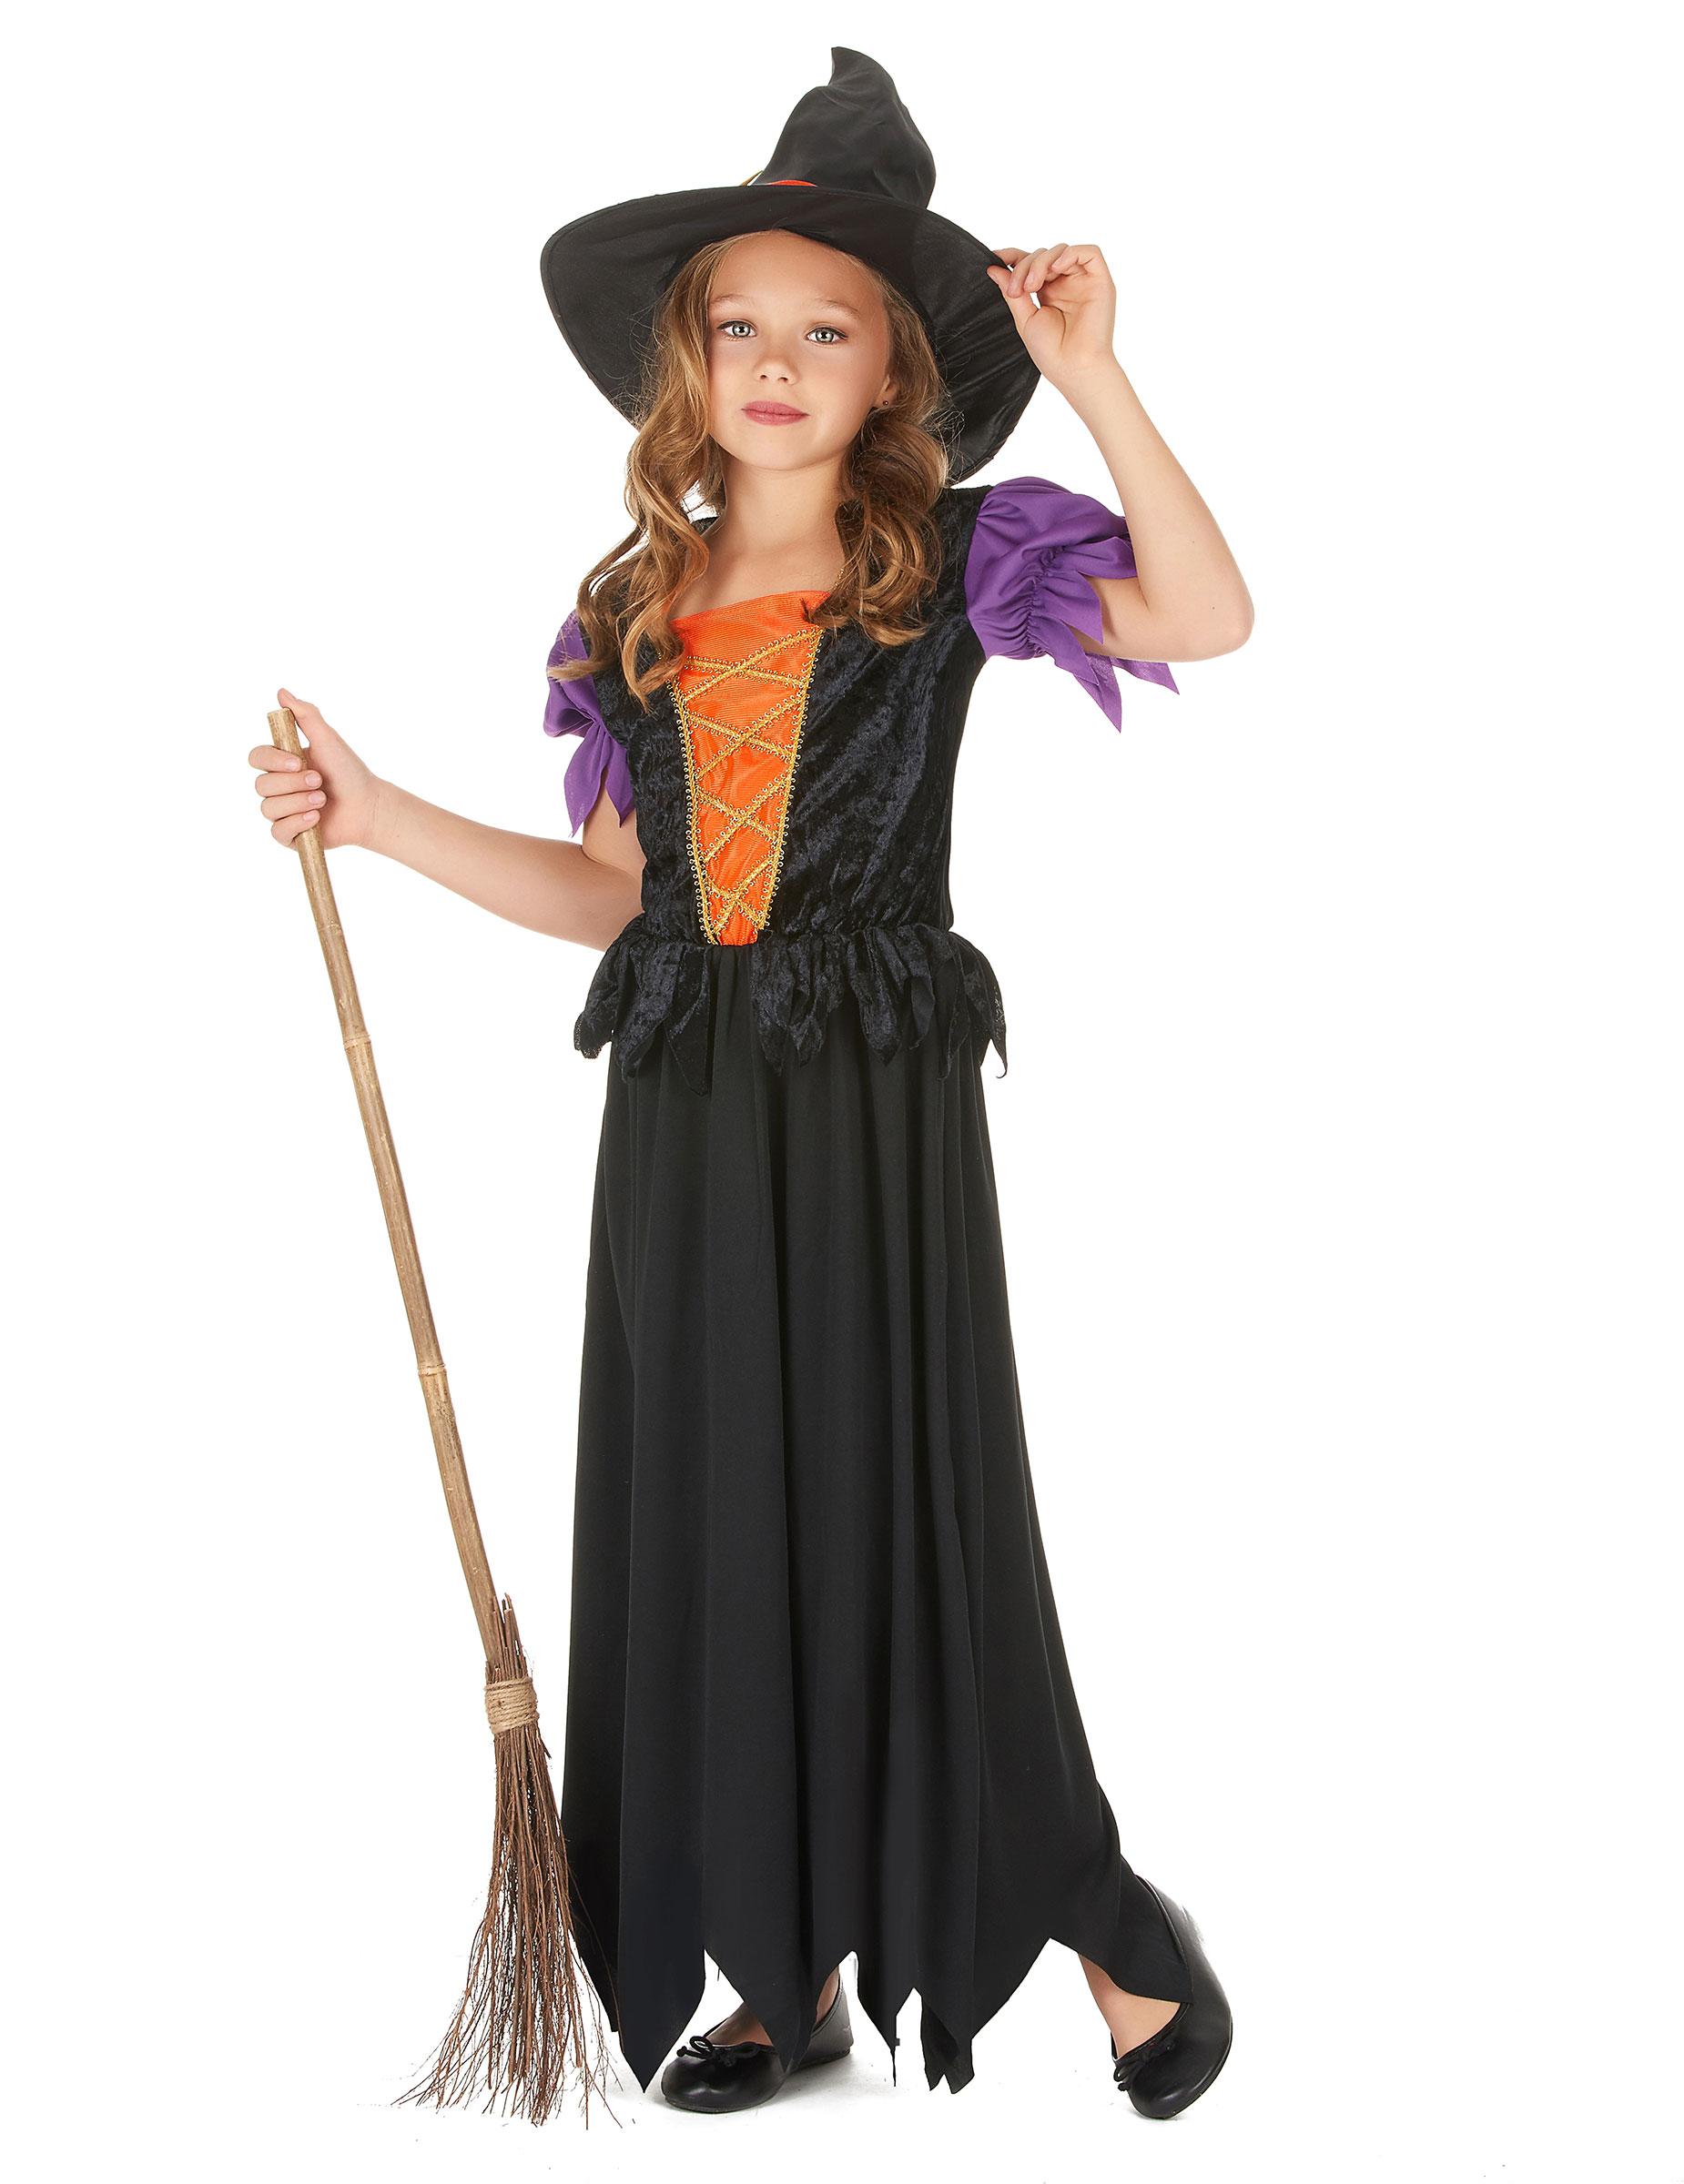 c5a4578c7a08 Costume strega nero e arancione bambina